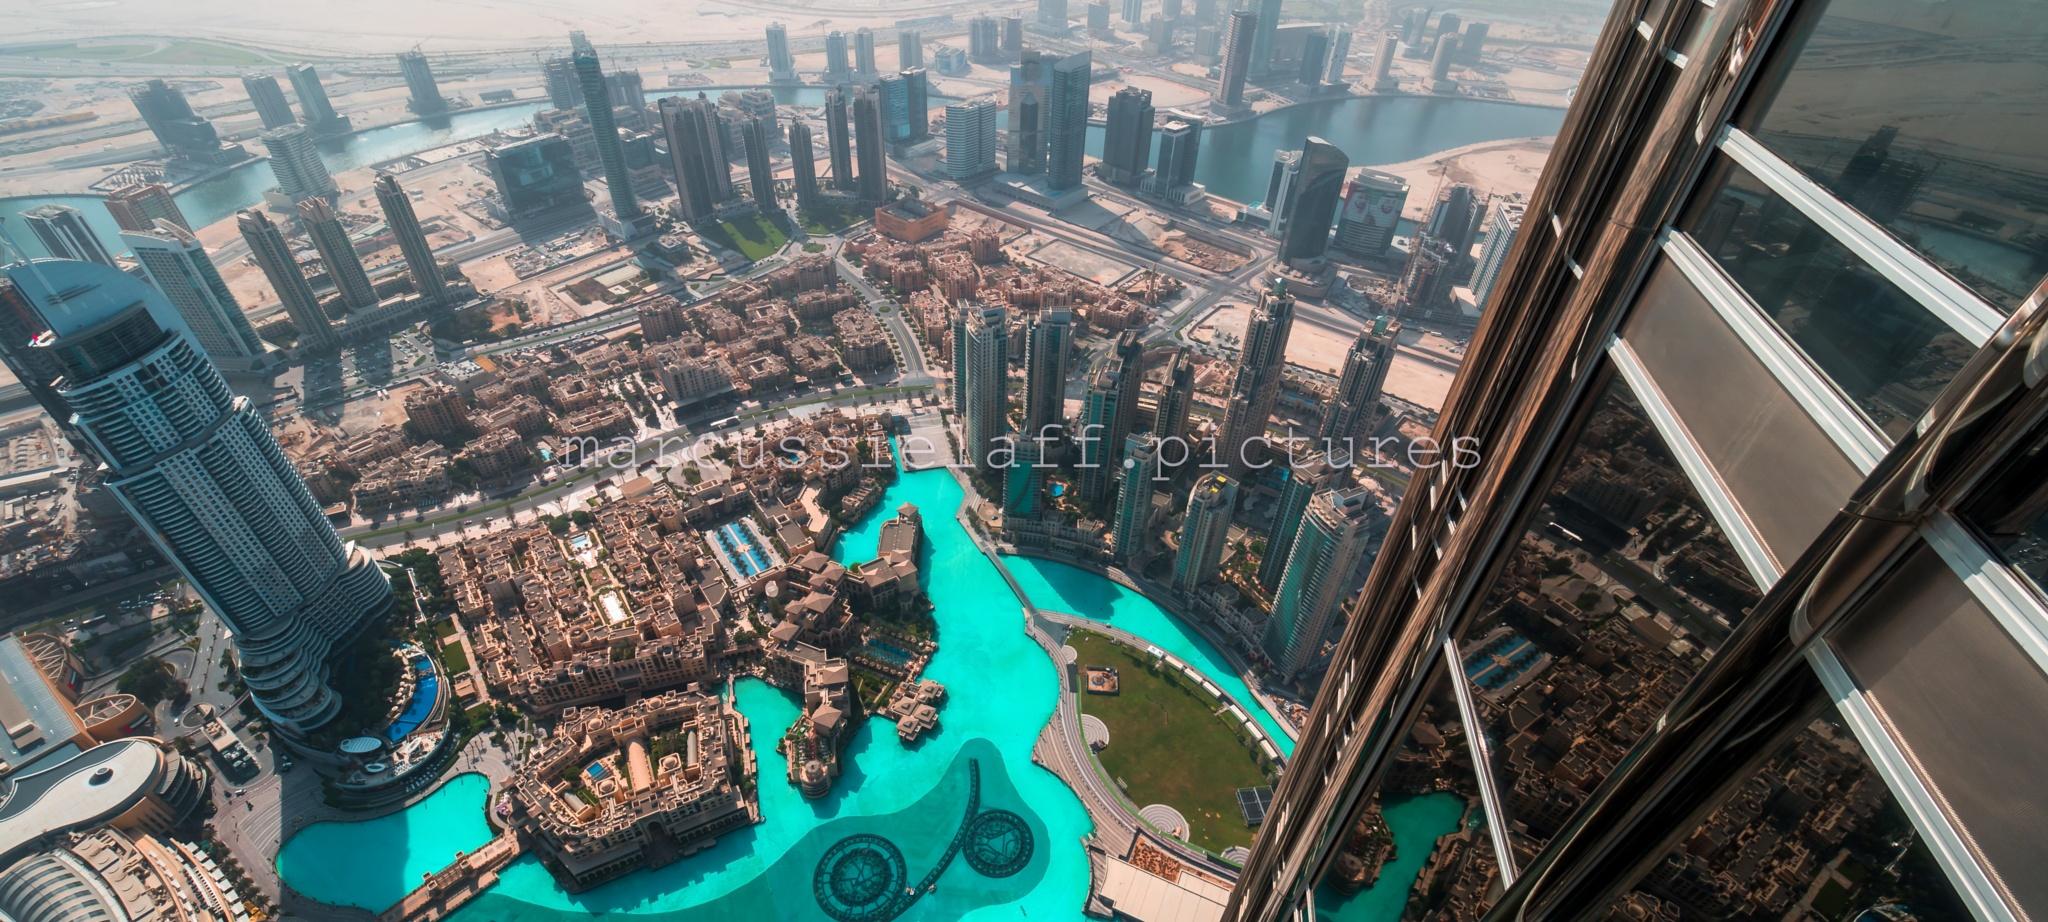 Dubai by Marcus Sielaff